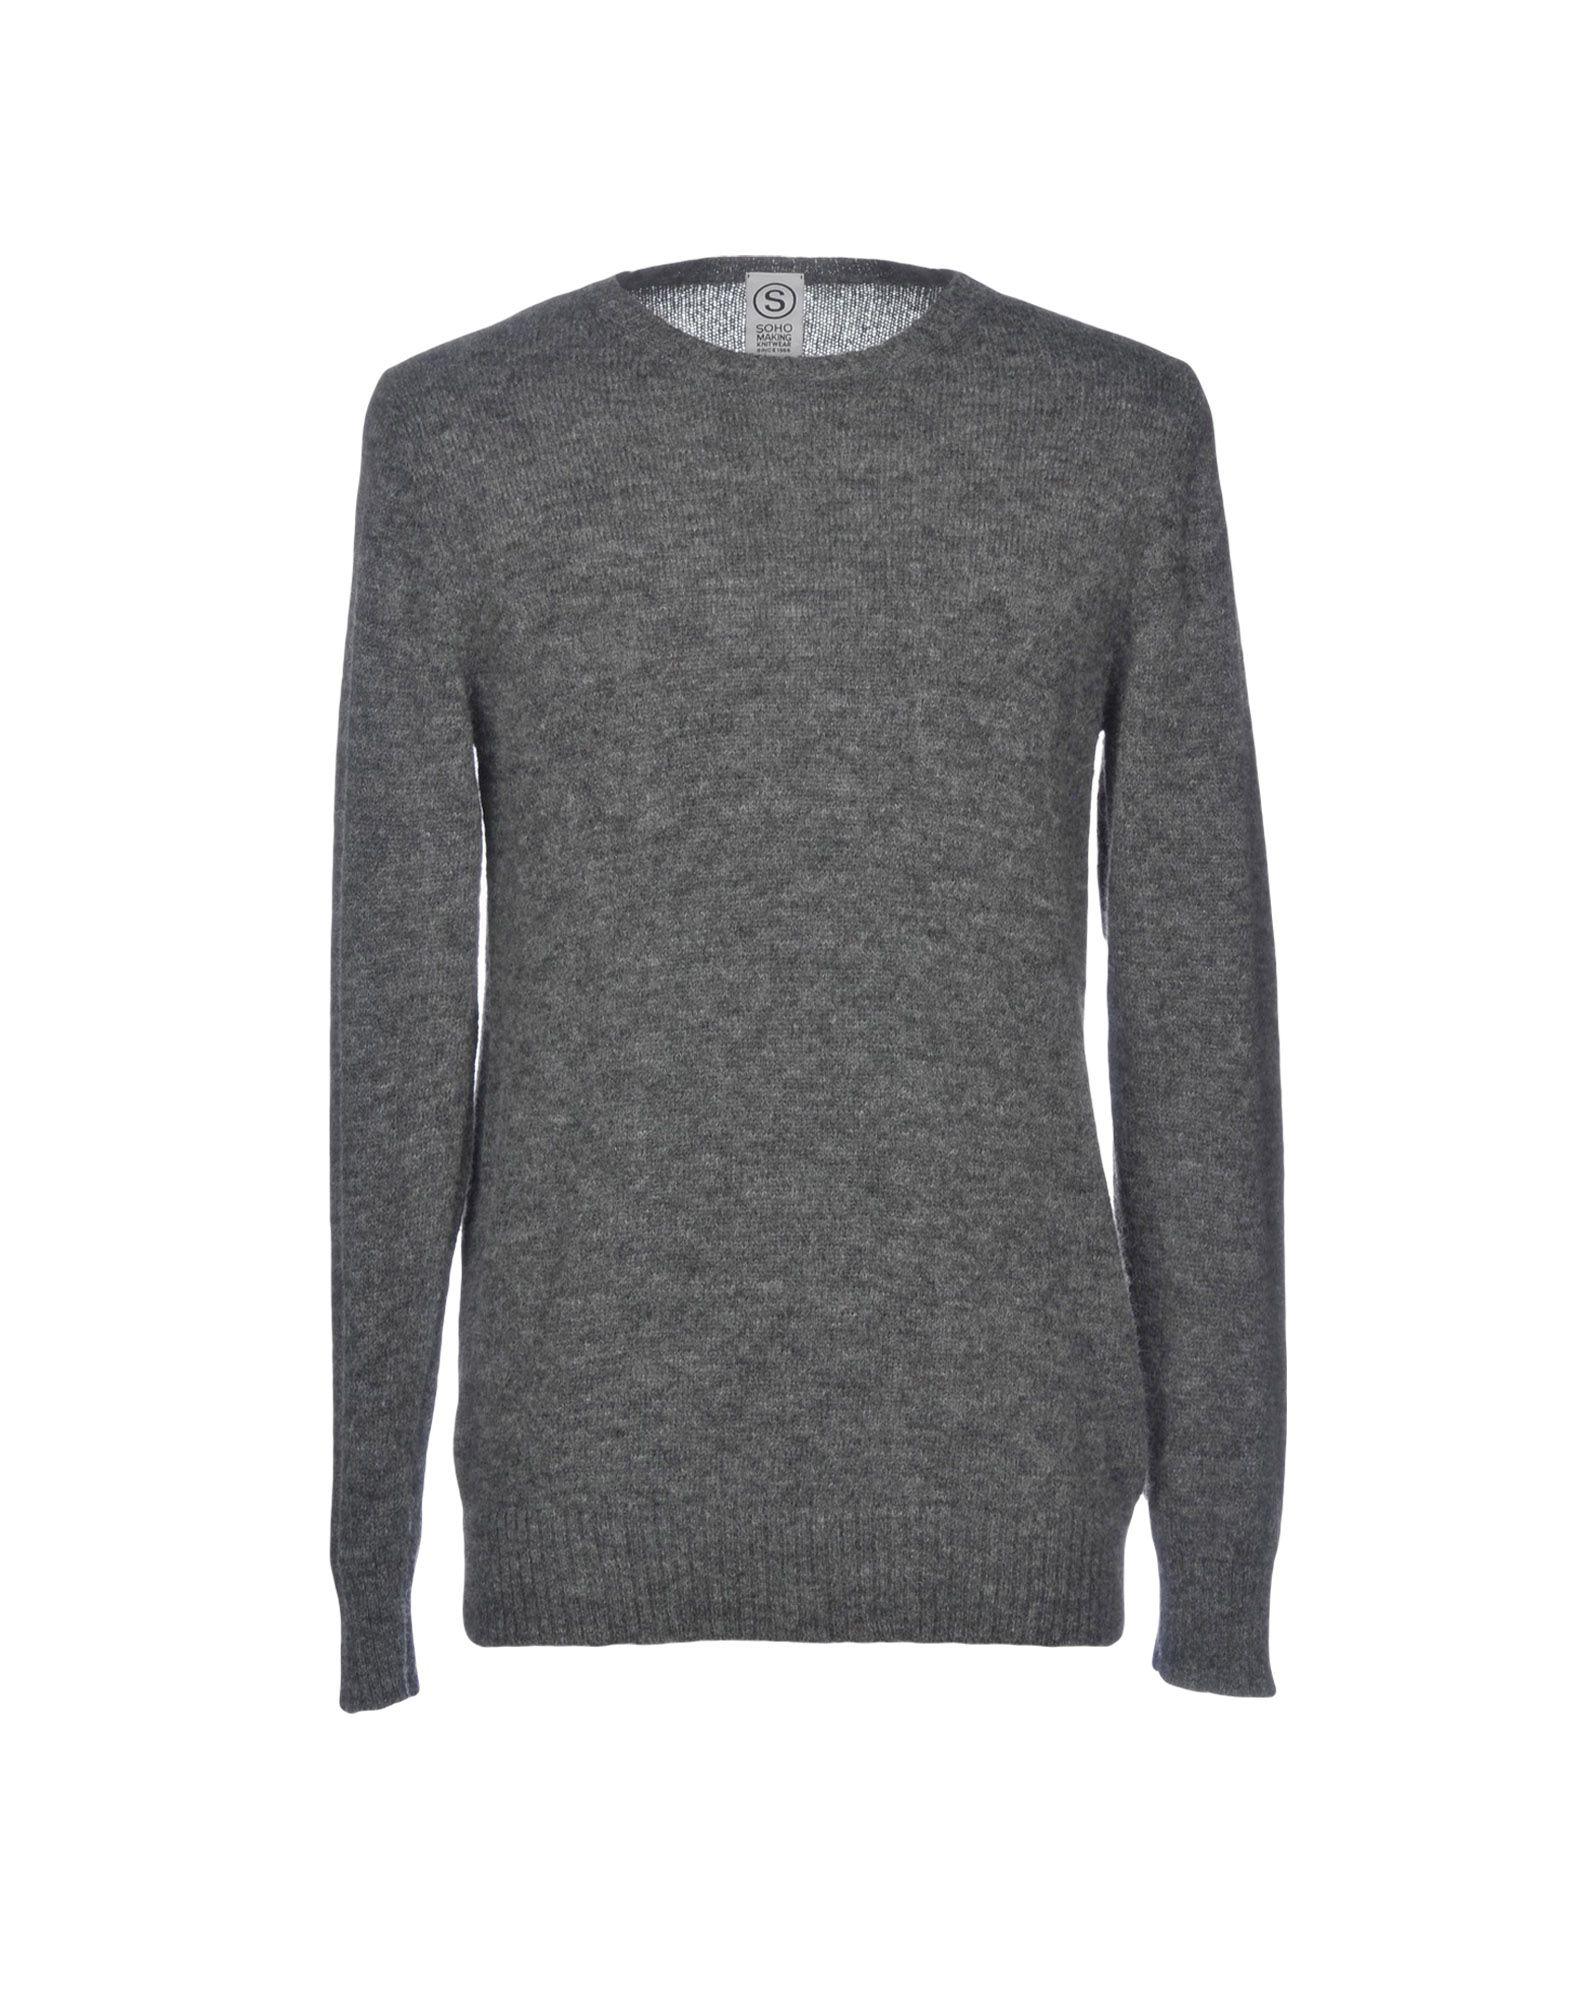 SOHO Sweater in Light Grey